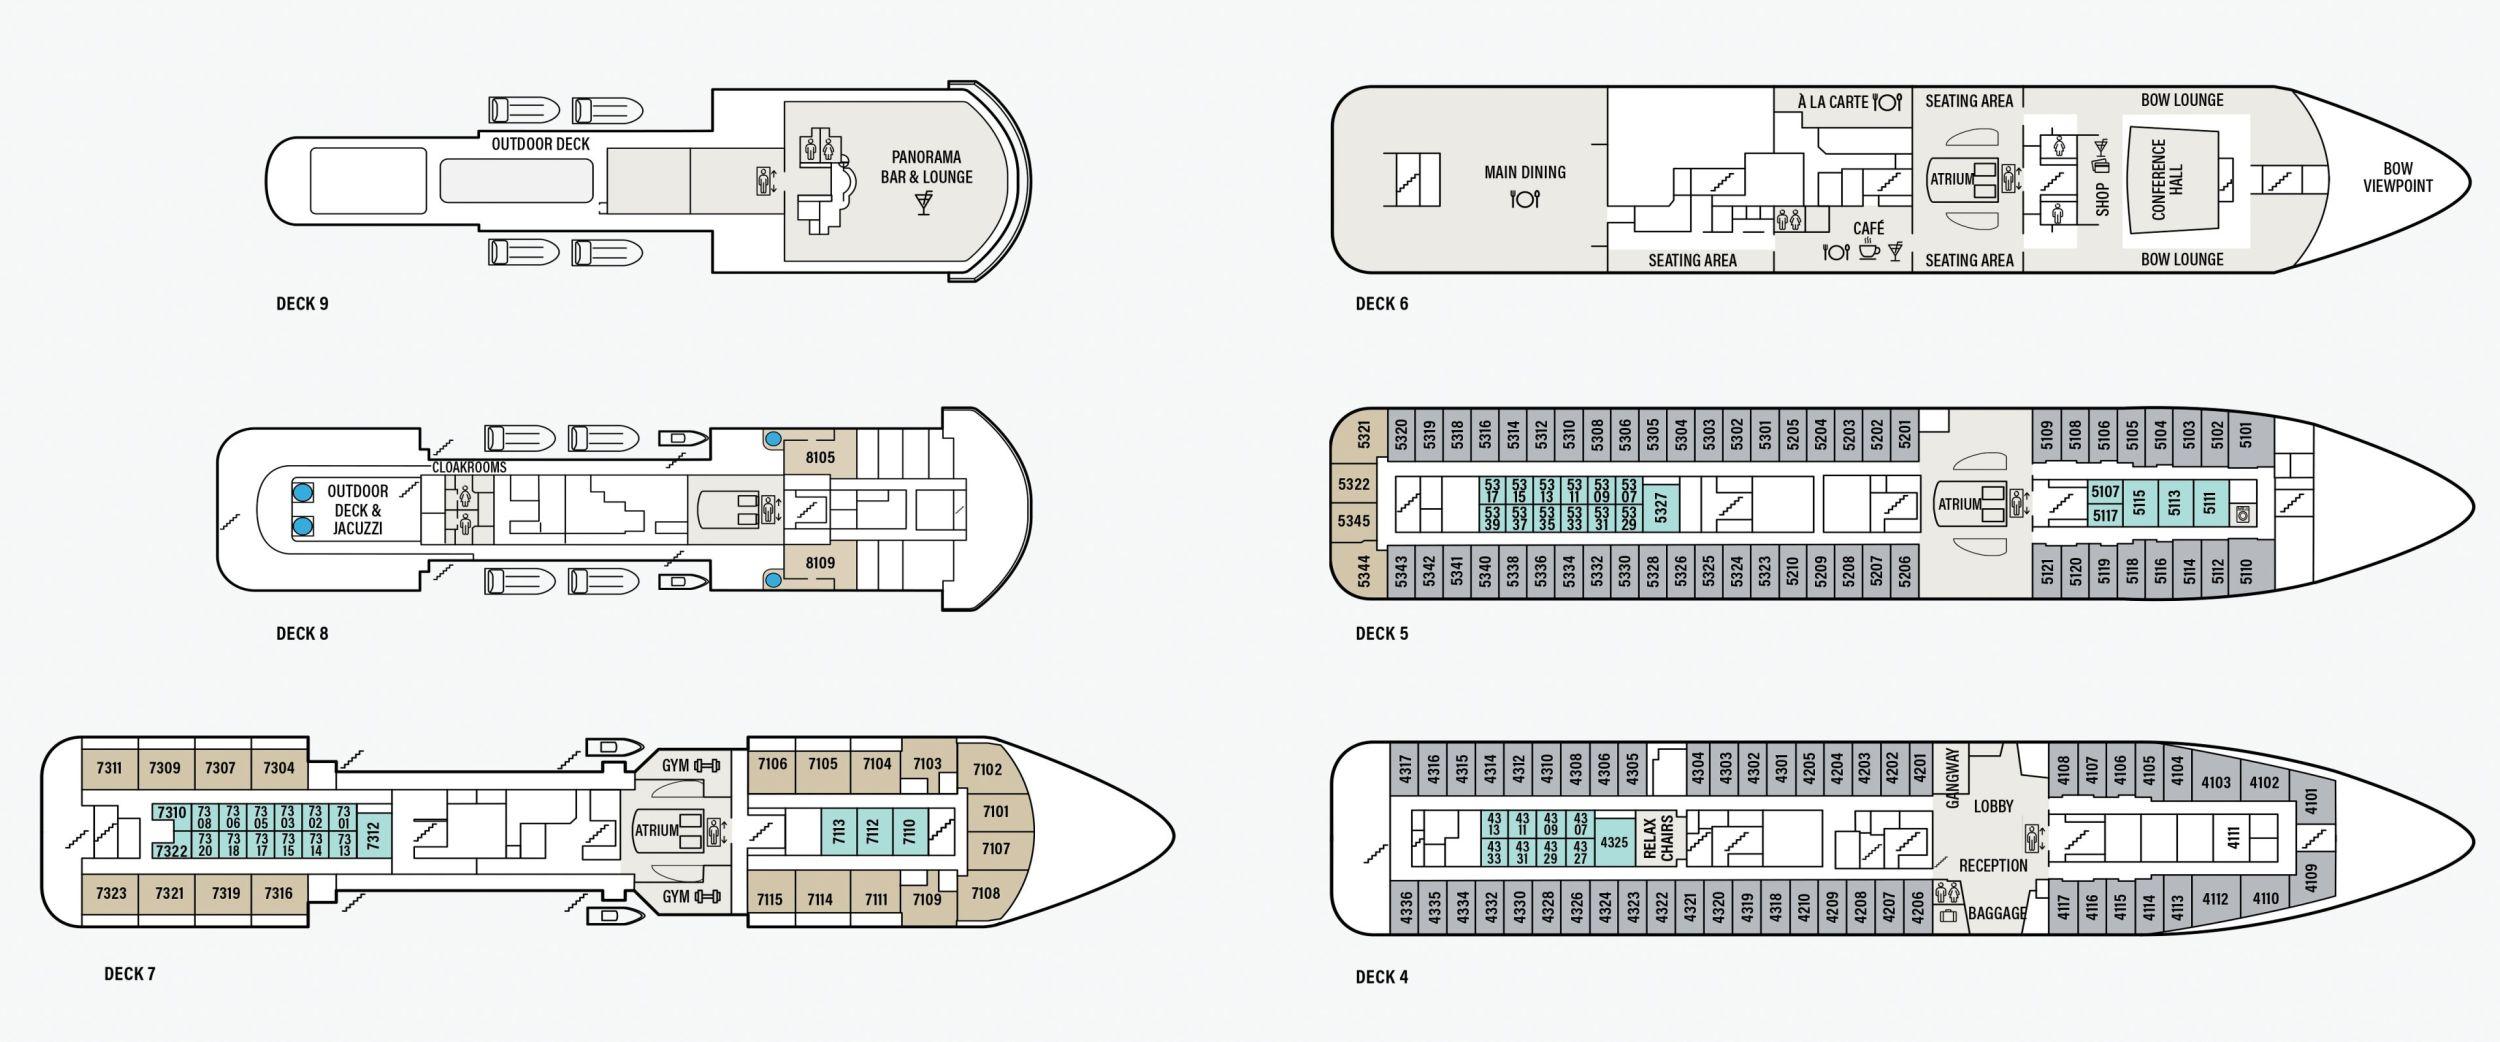 Deck overview Havila Voyages